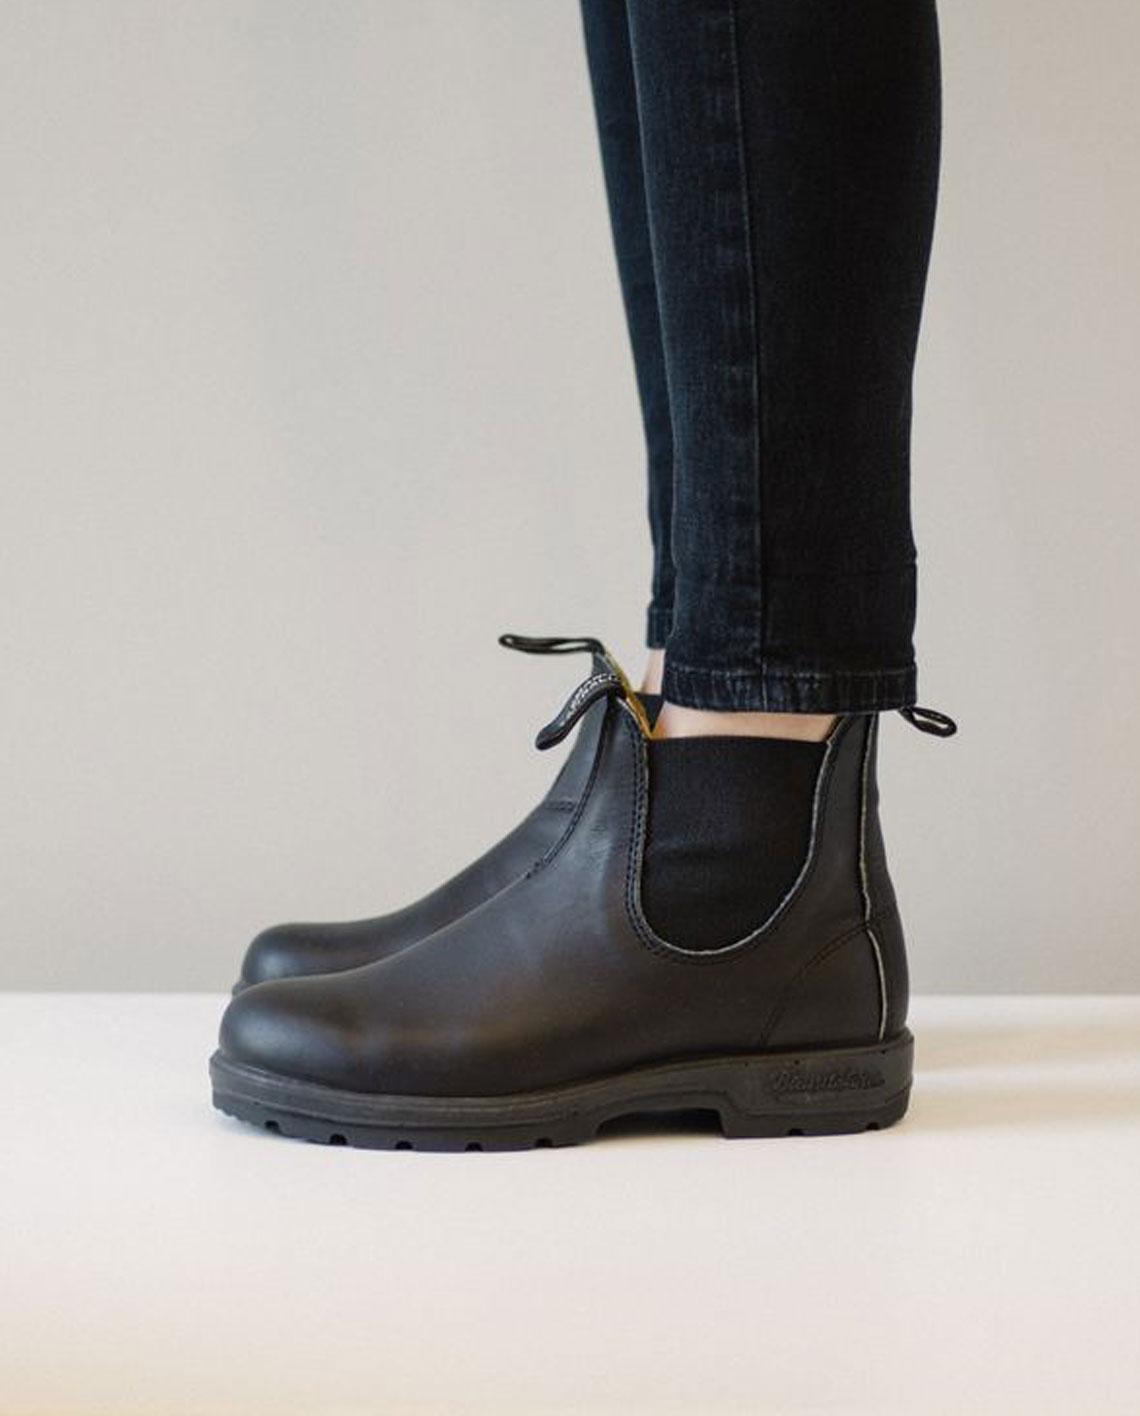 Blundstone women's shoes free shipping